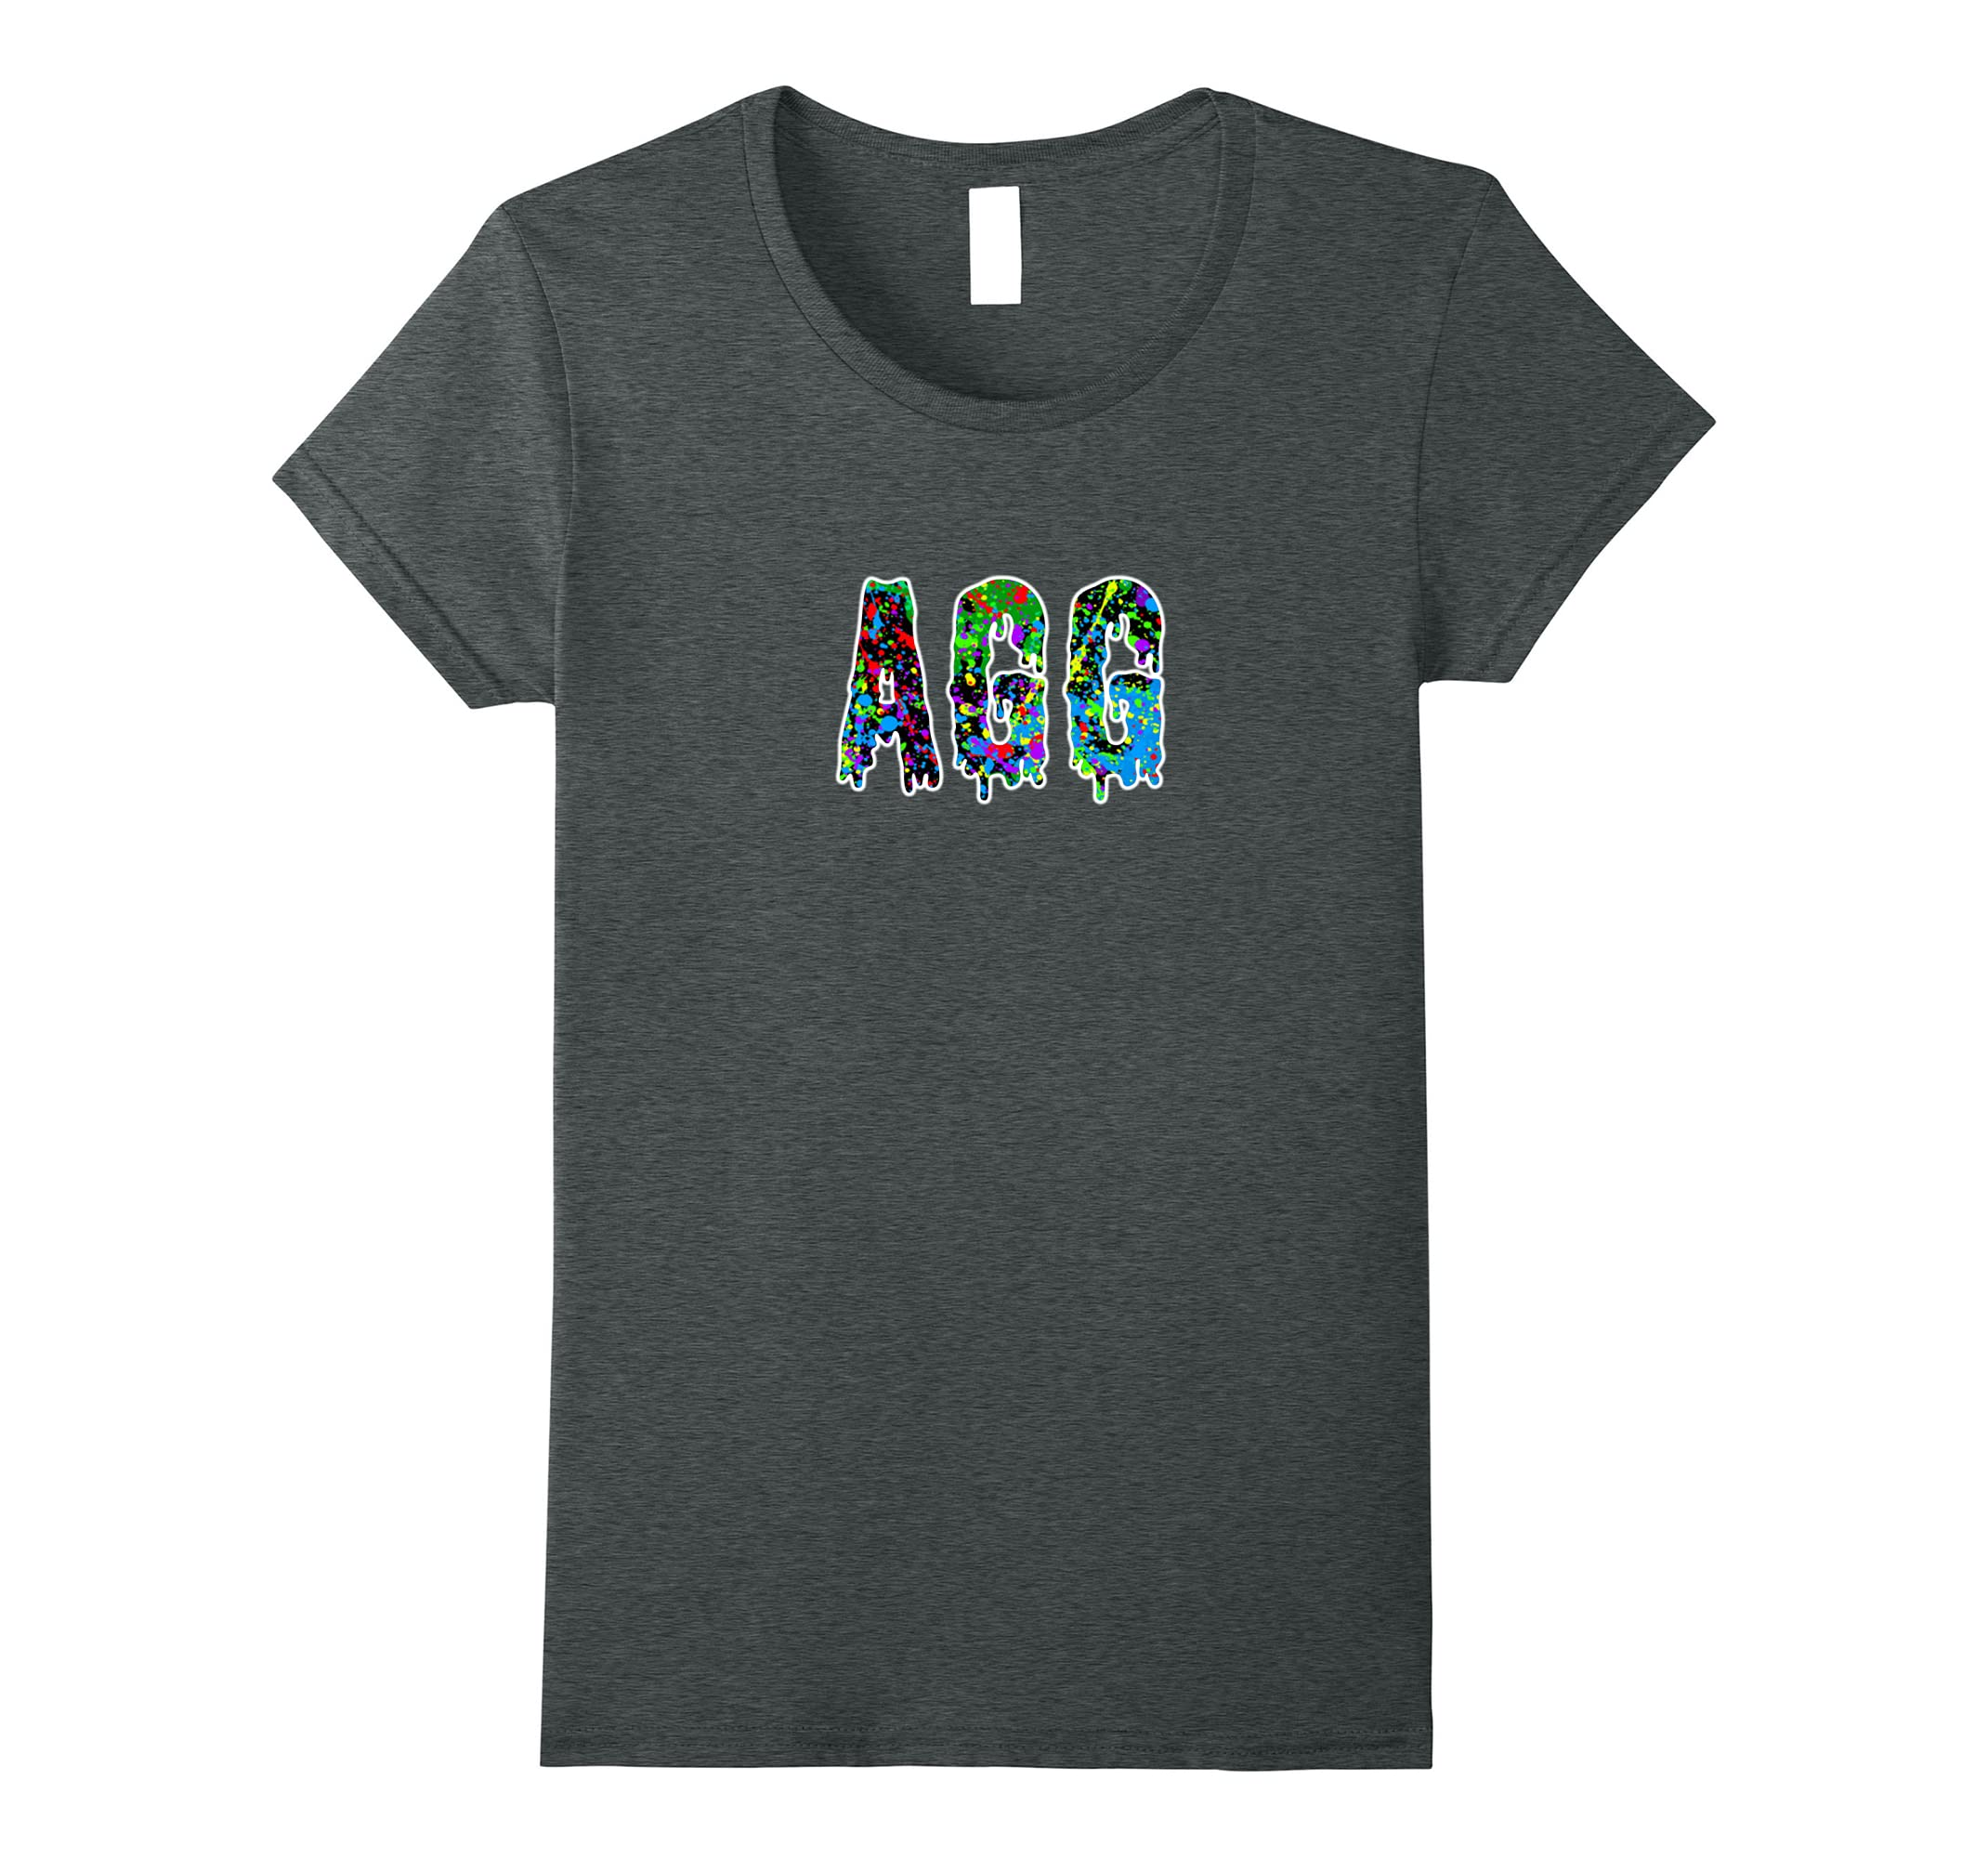 AGG Aggro Clean Paintball T Shirt-Tovacu